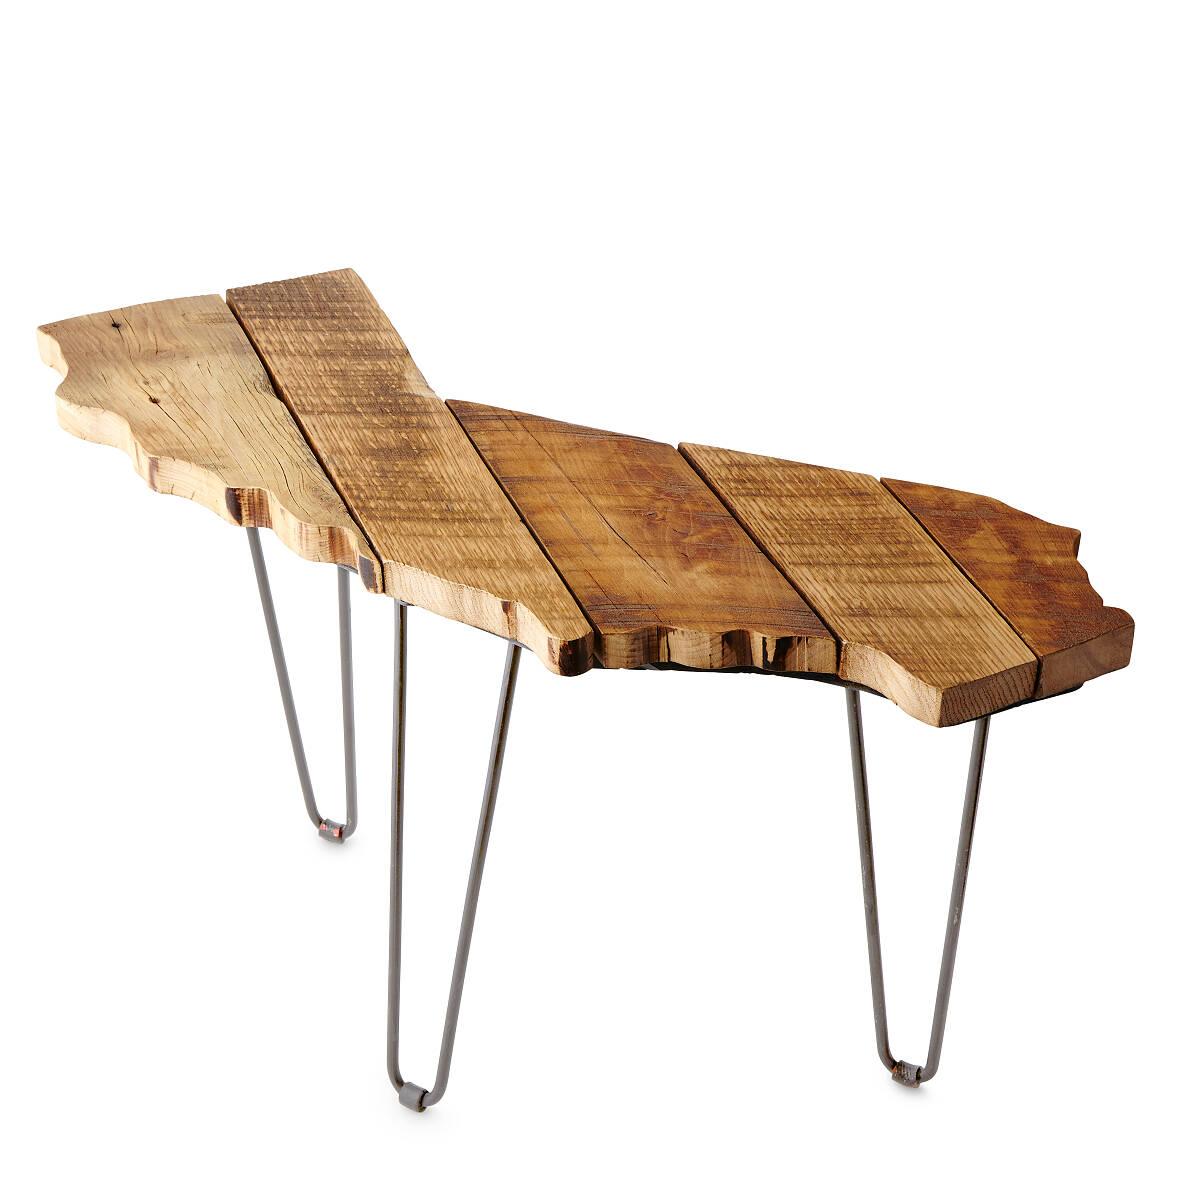 Barnwood State Side Tables 2 thumbnail - Barnwood State Side Tables Reclaimed Wood Table UncommonGoods